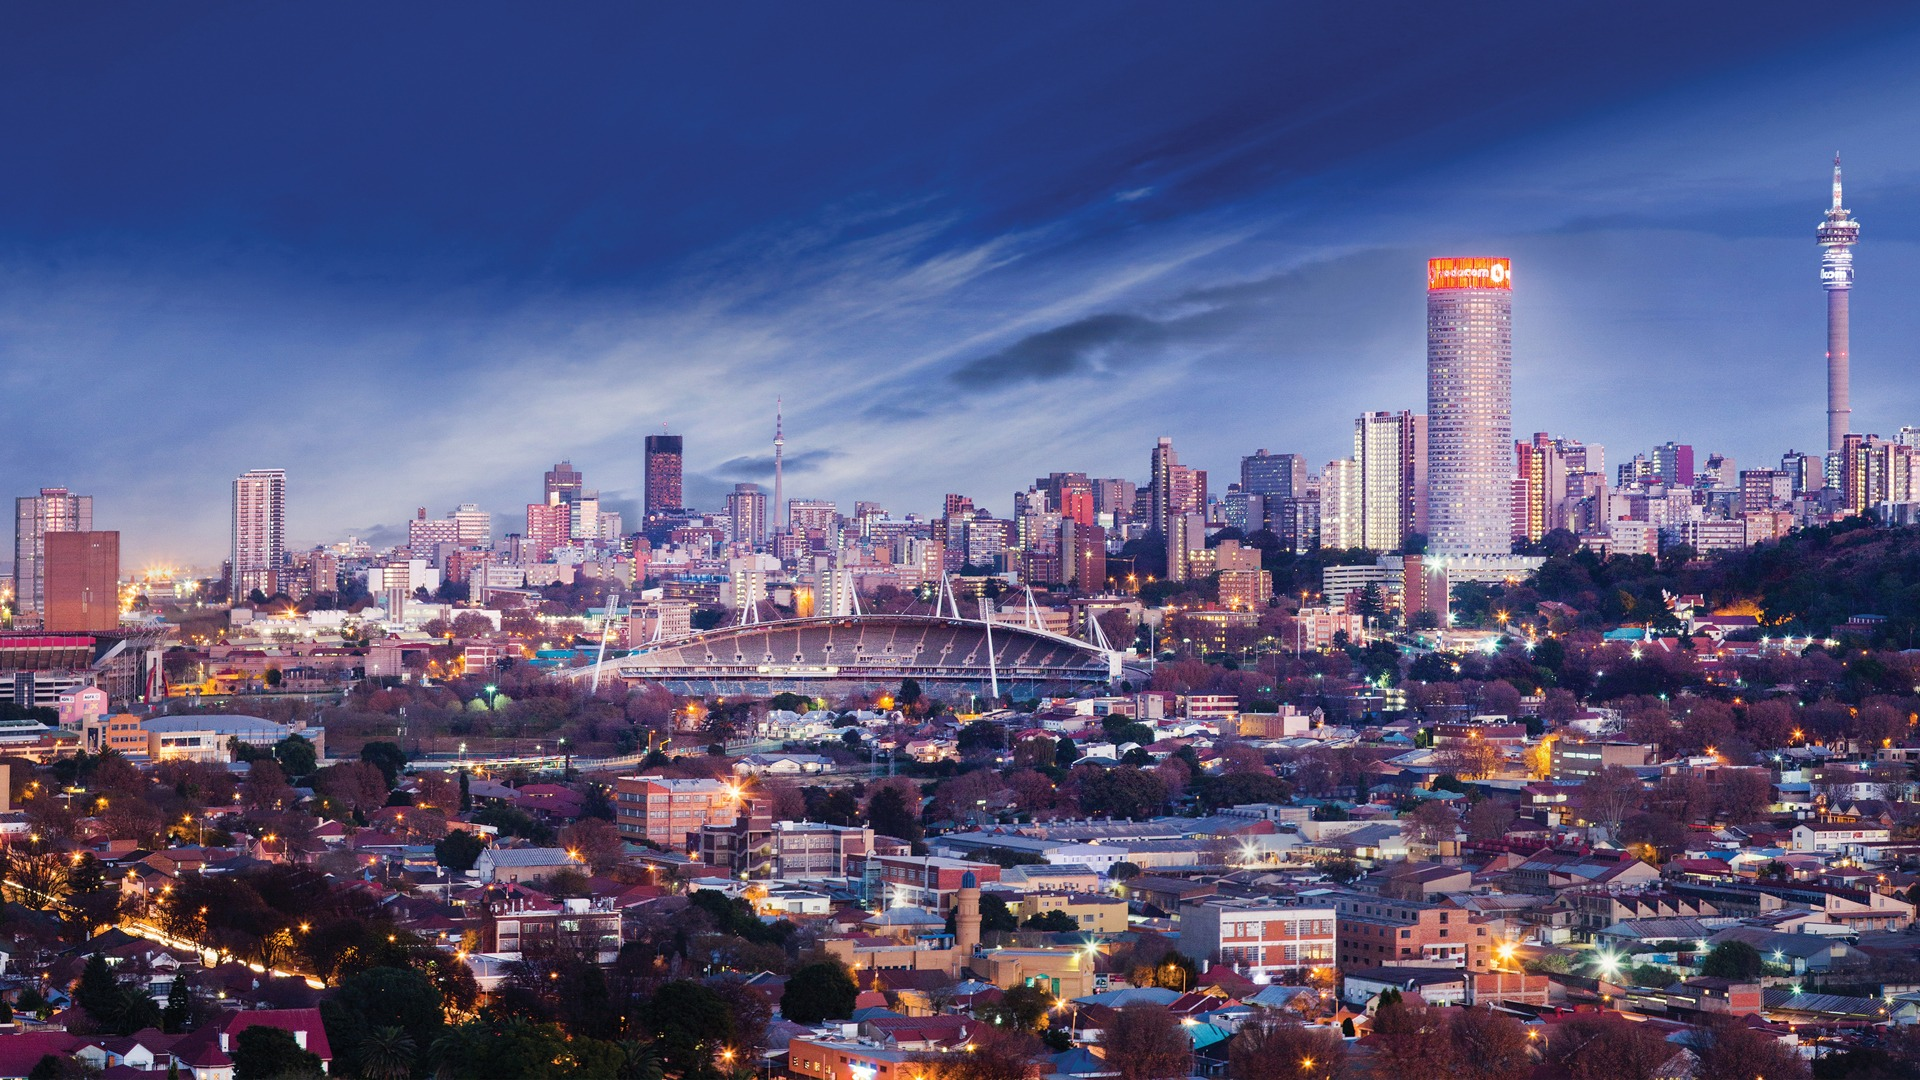 Is Johannesburg the AI tech capital of africa